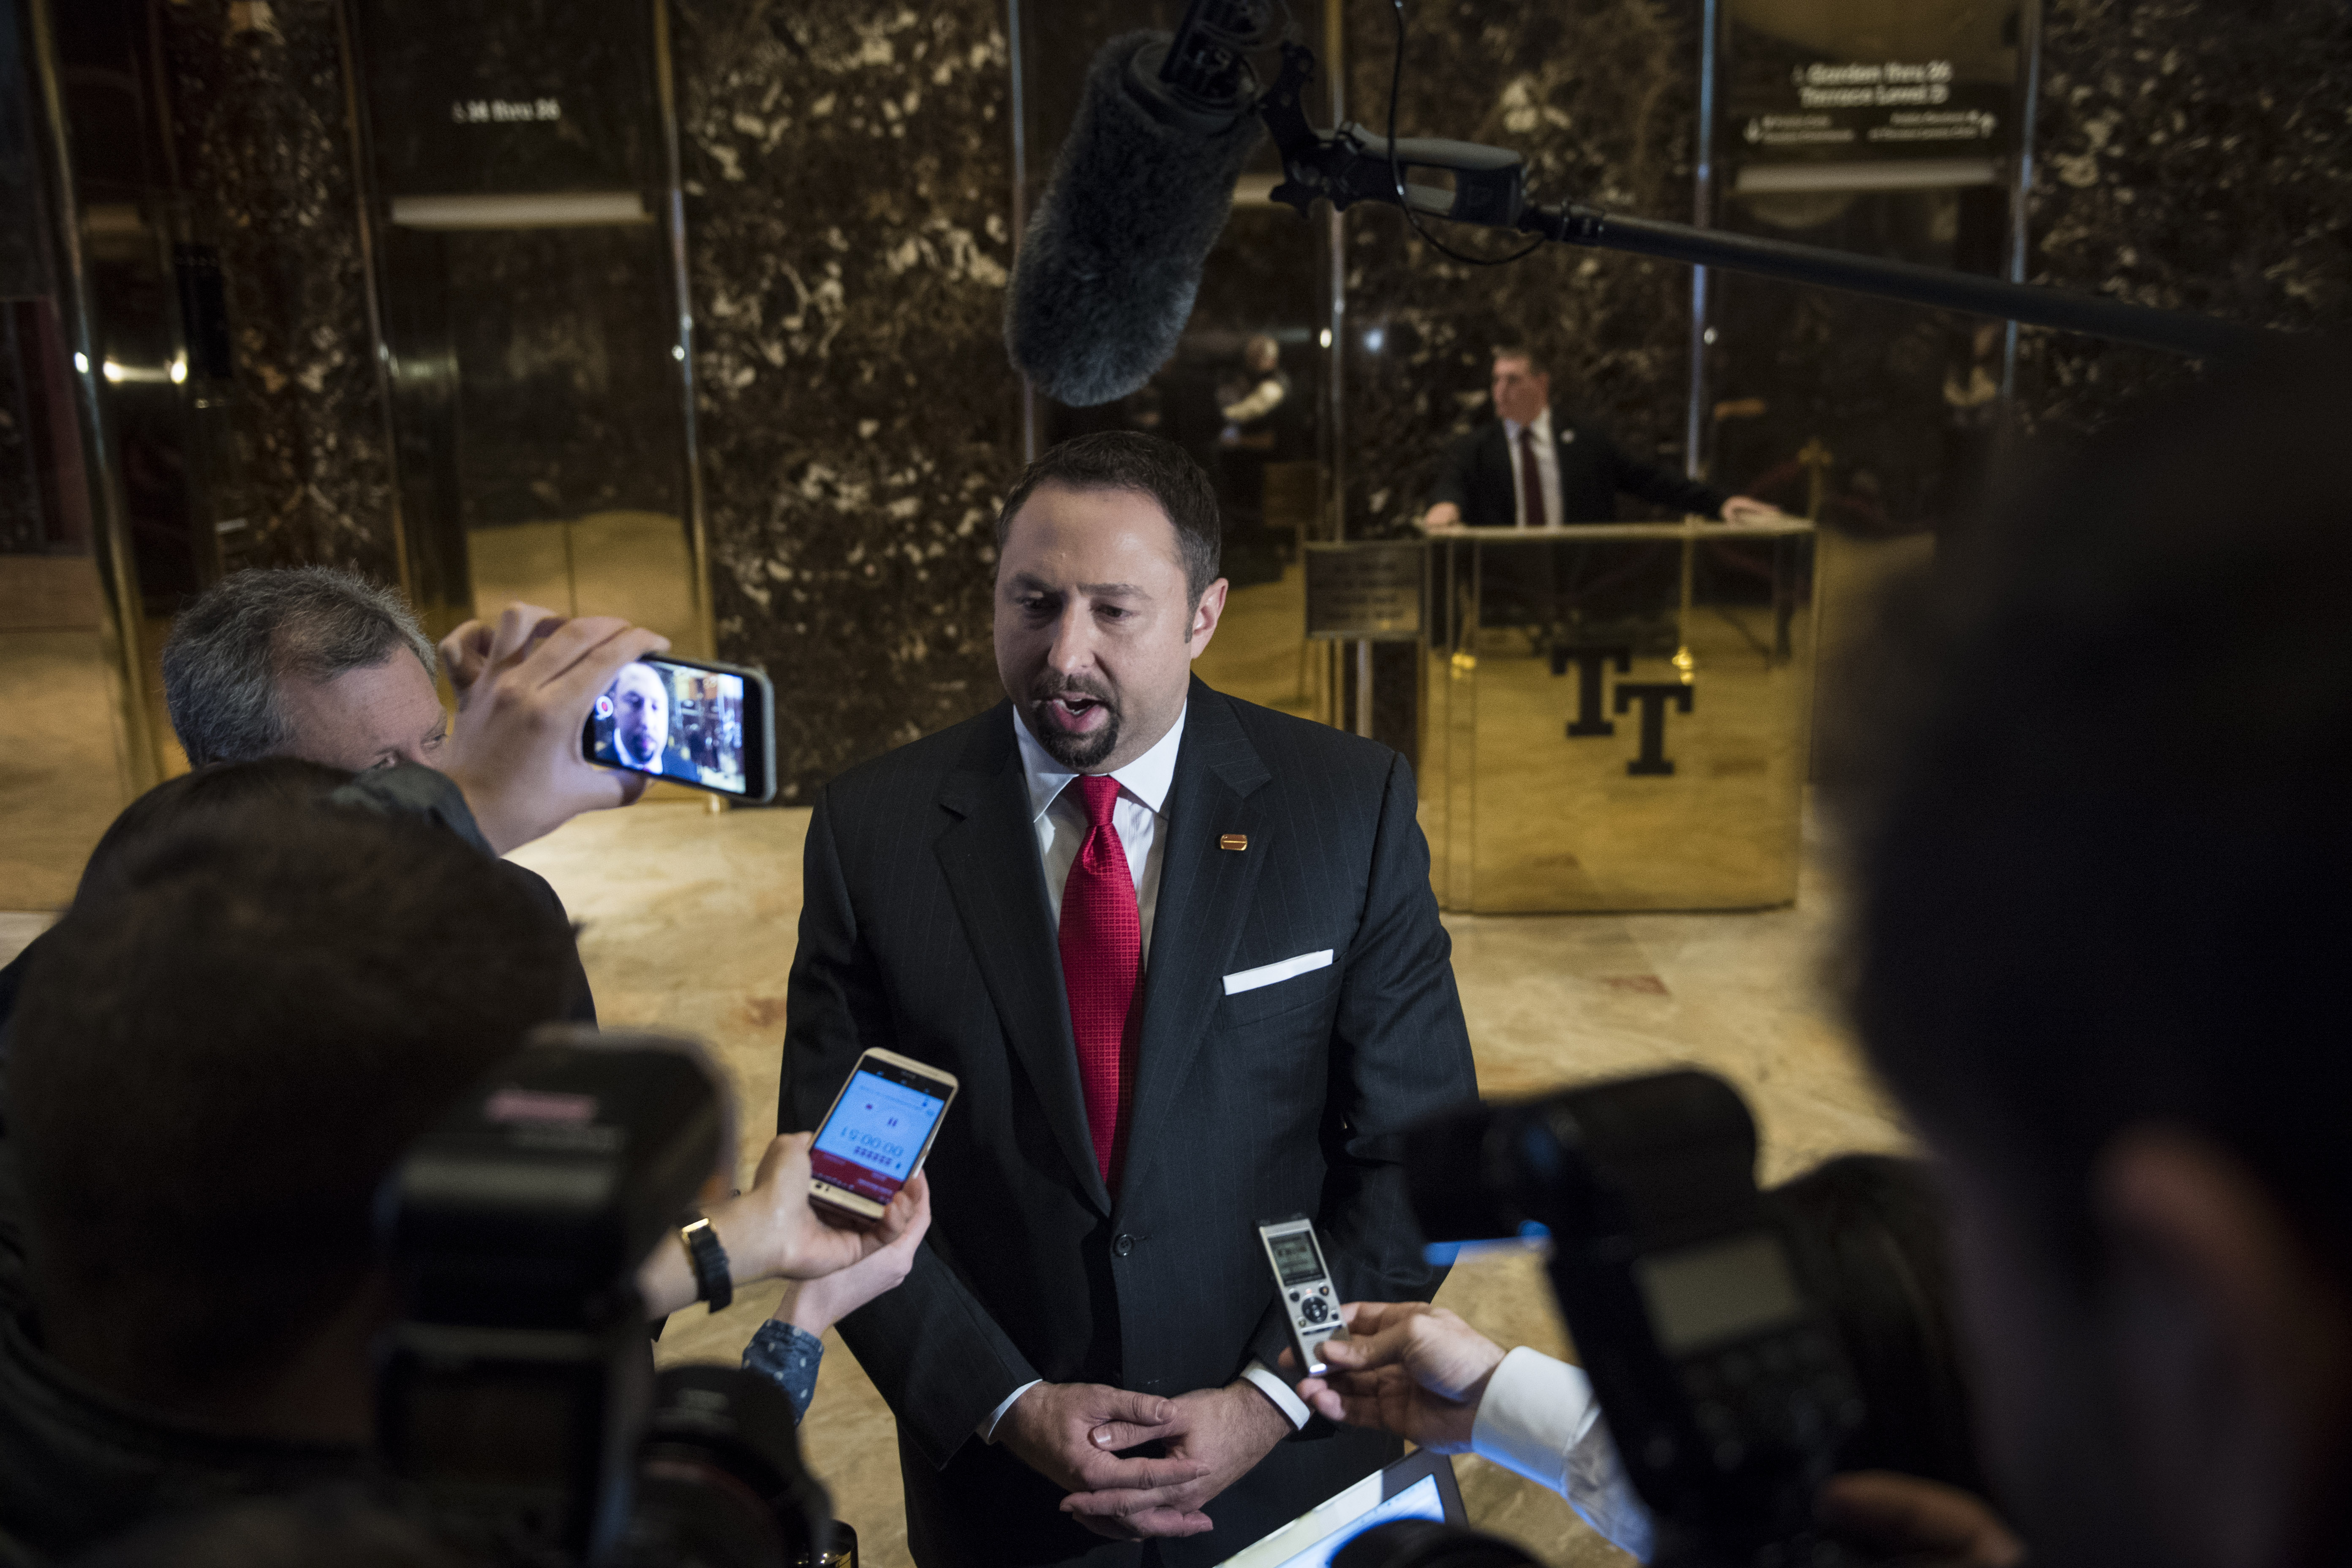 Former Trump spokesperson Jason Miller speaking to members of the media inside Trump Tower in New York City in 2016.